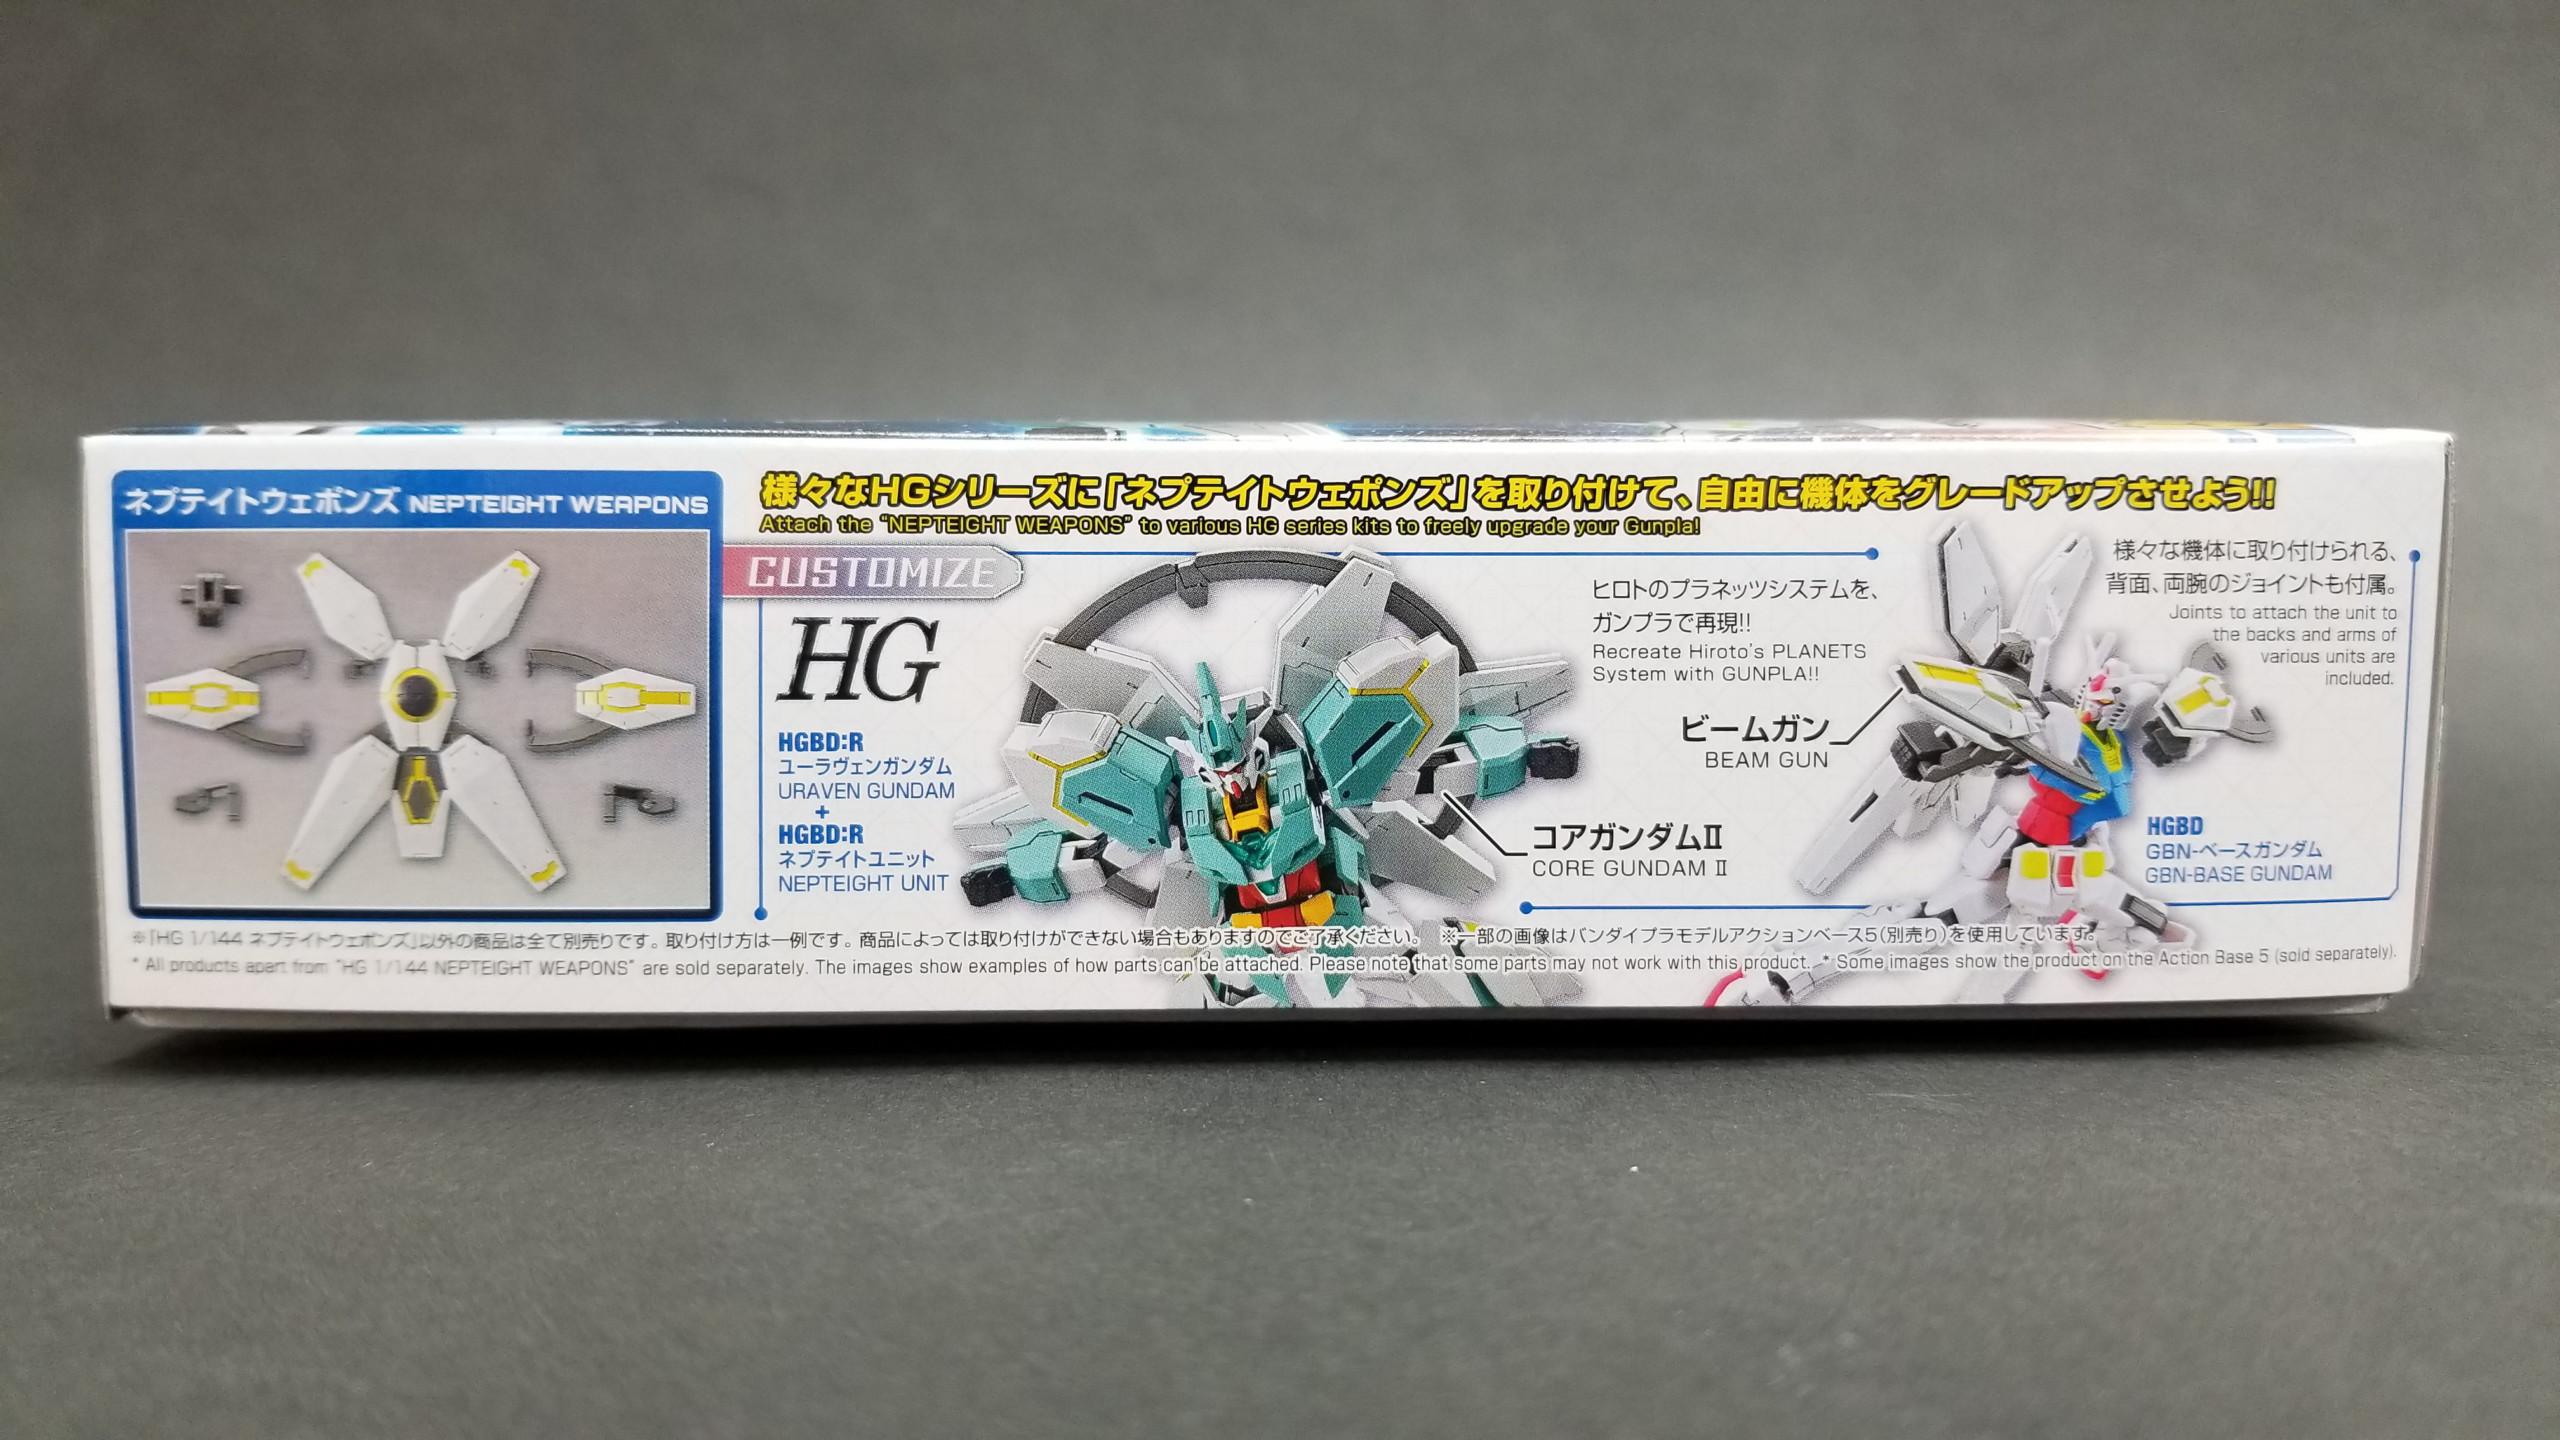 1/144 HGBD:R Nepteight Weapons